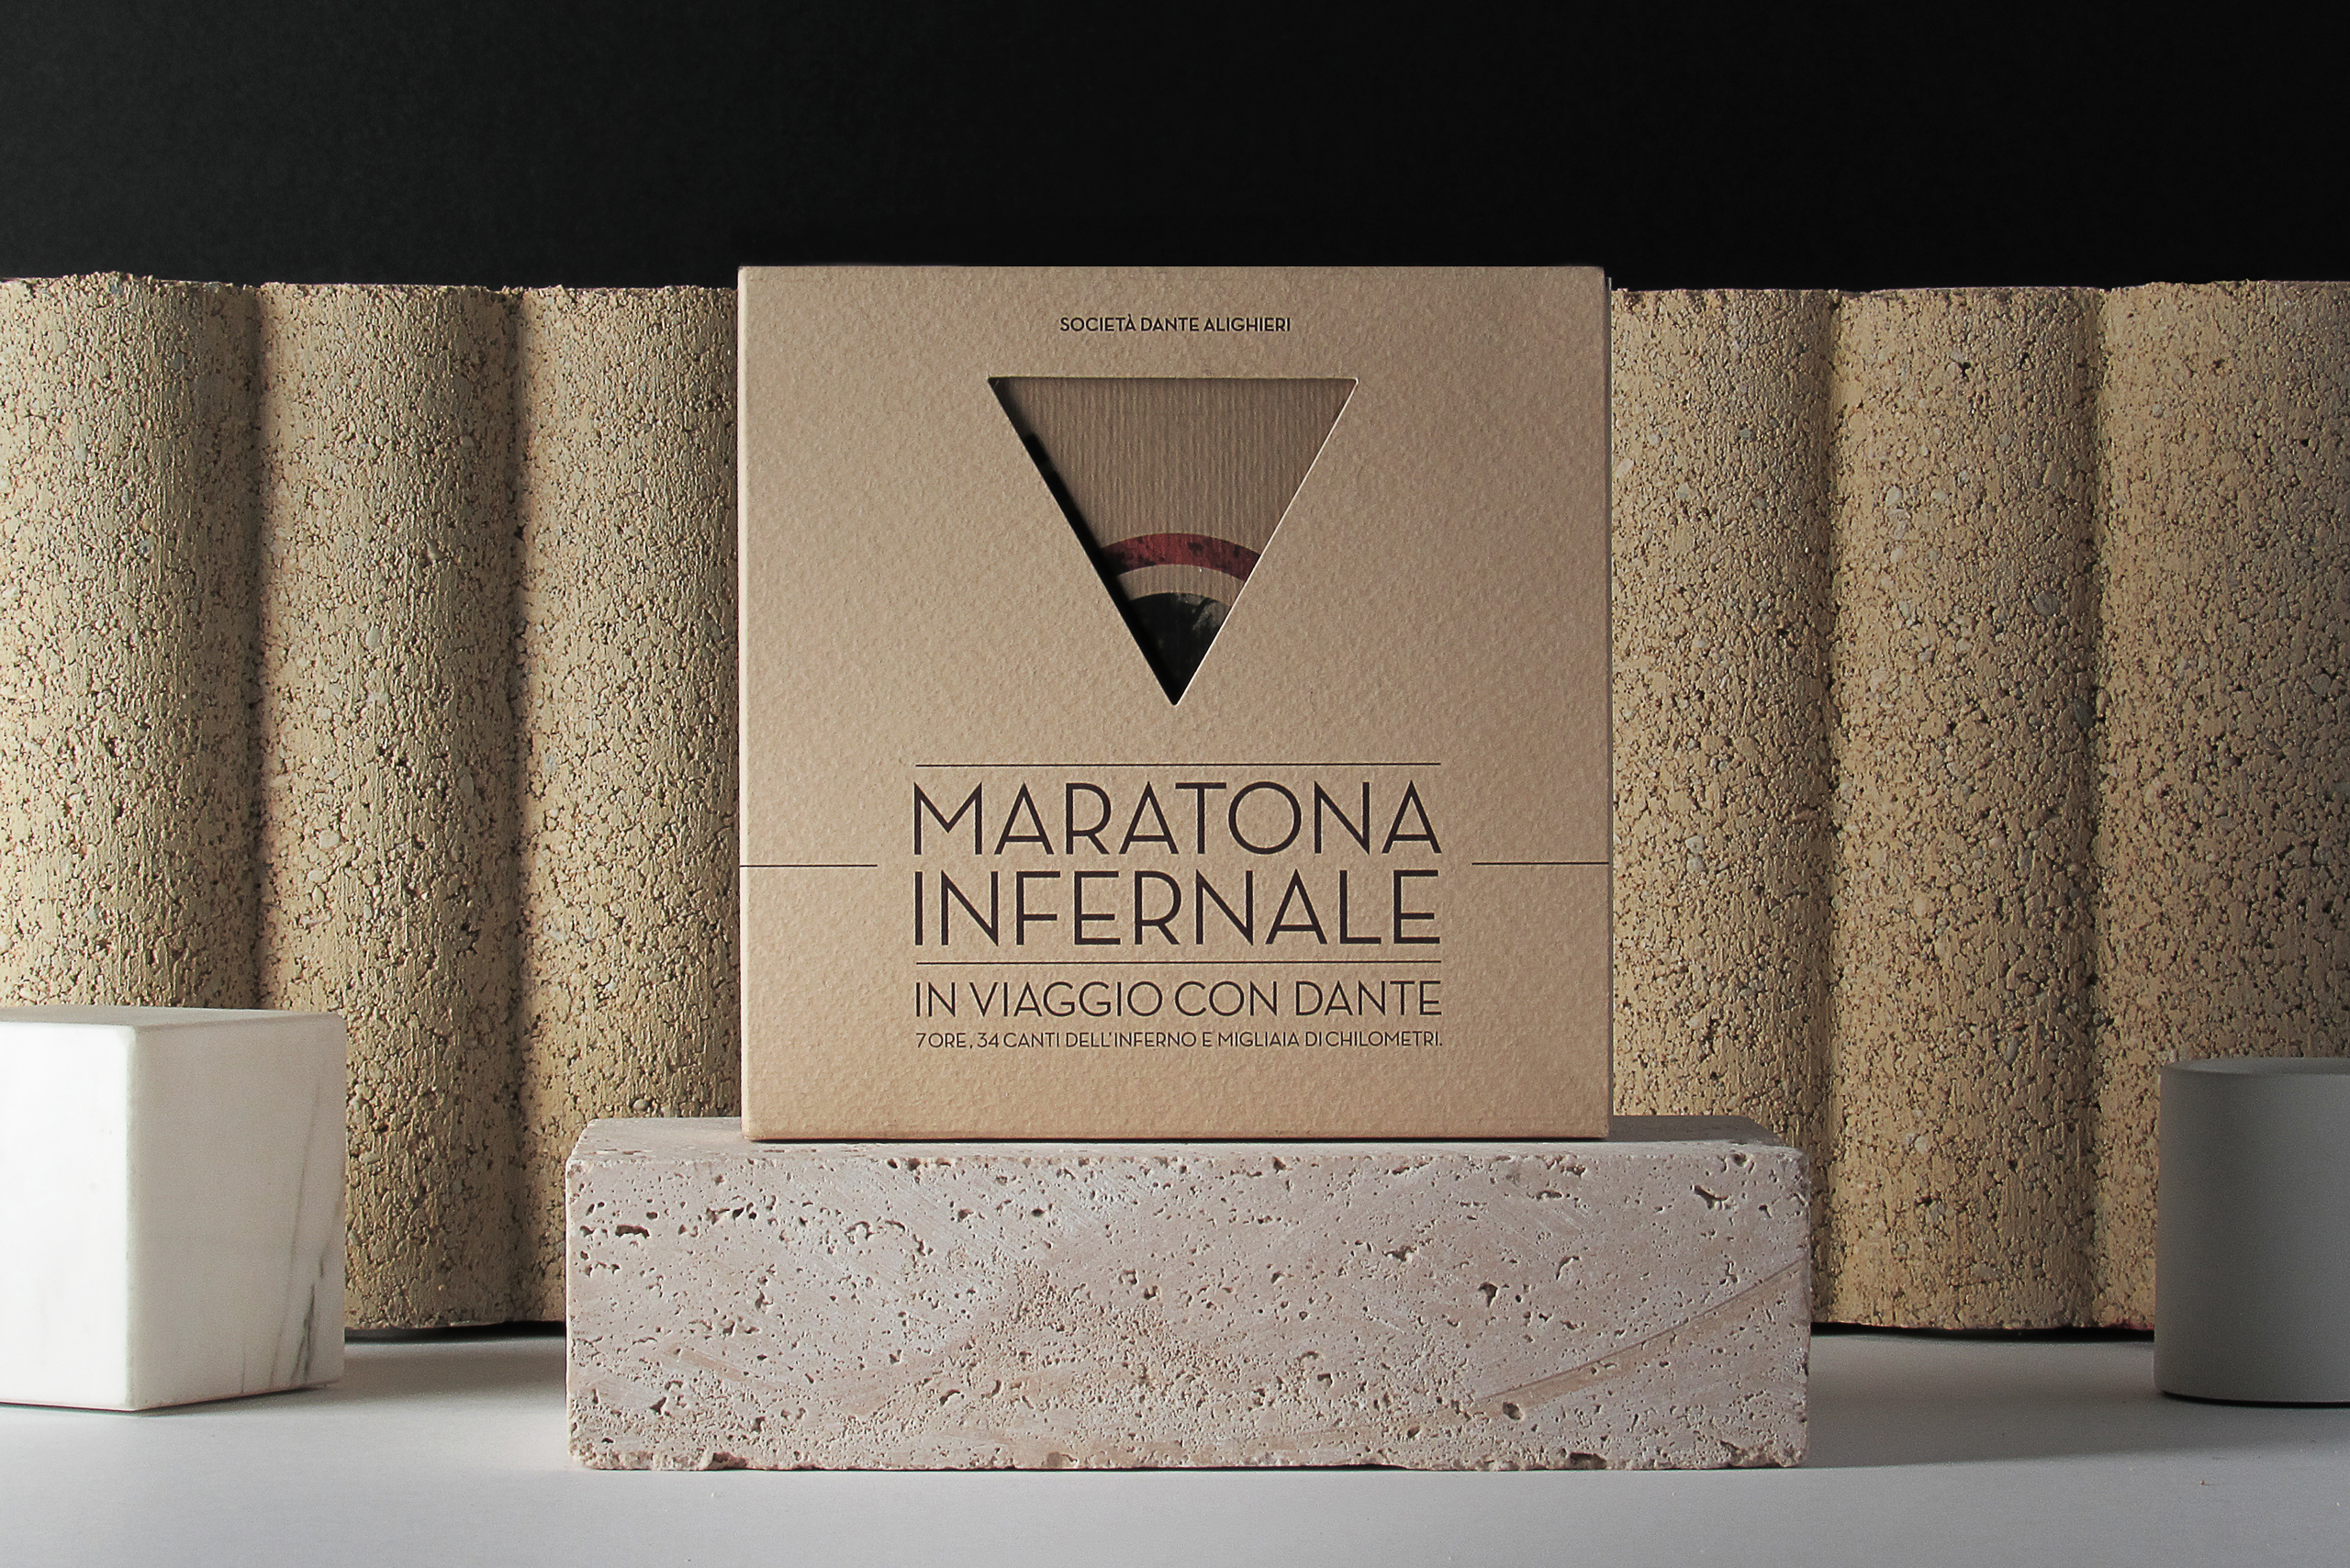 maratonainfernale_open